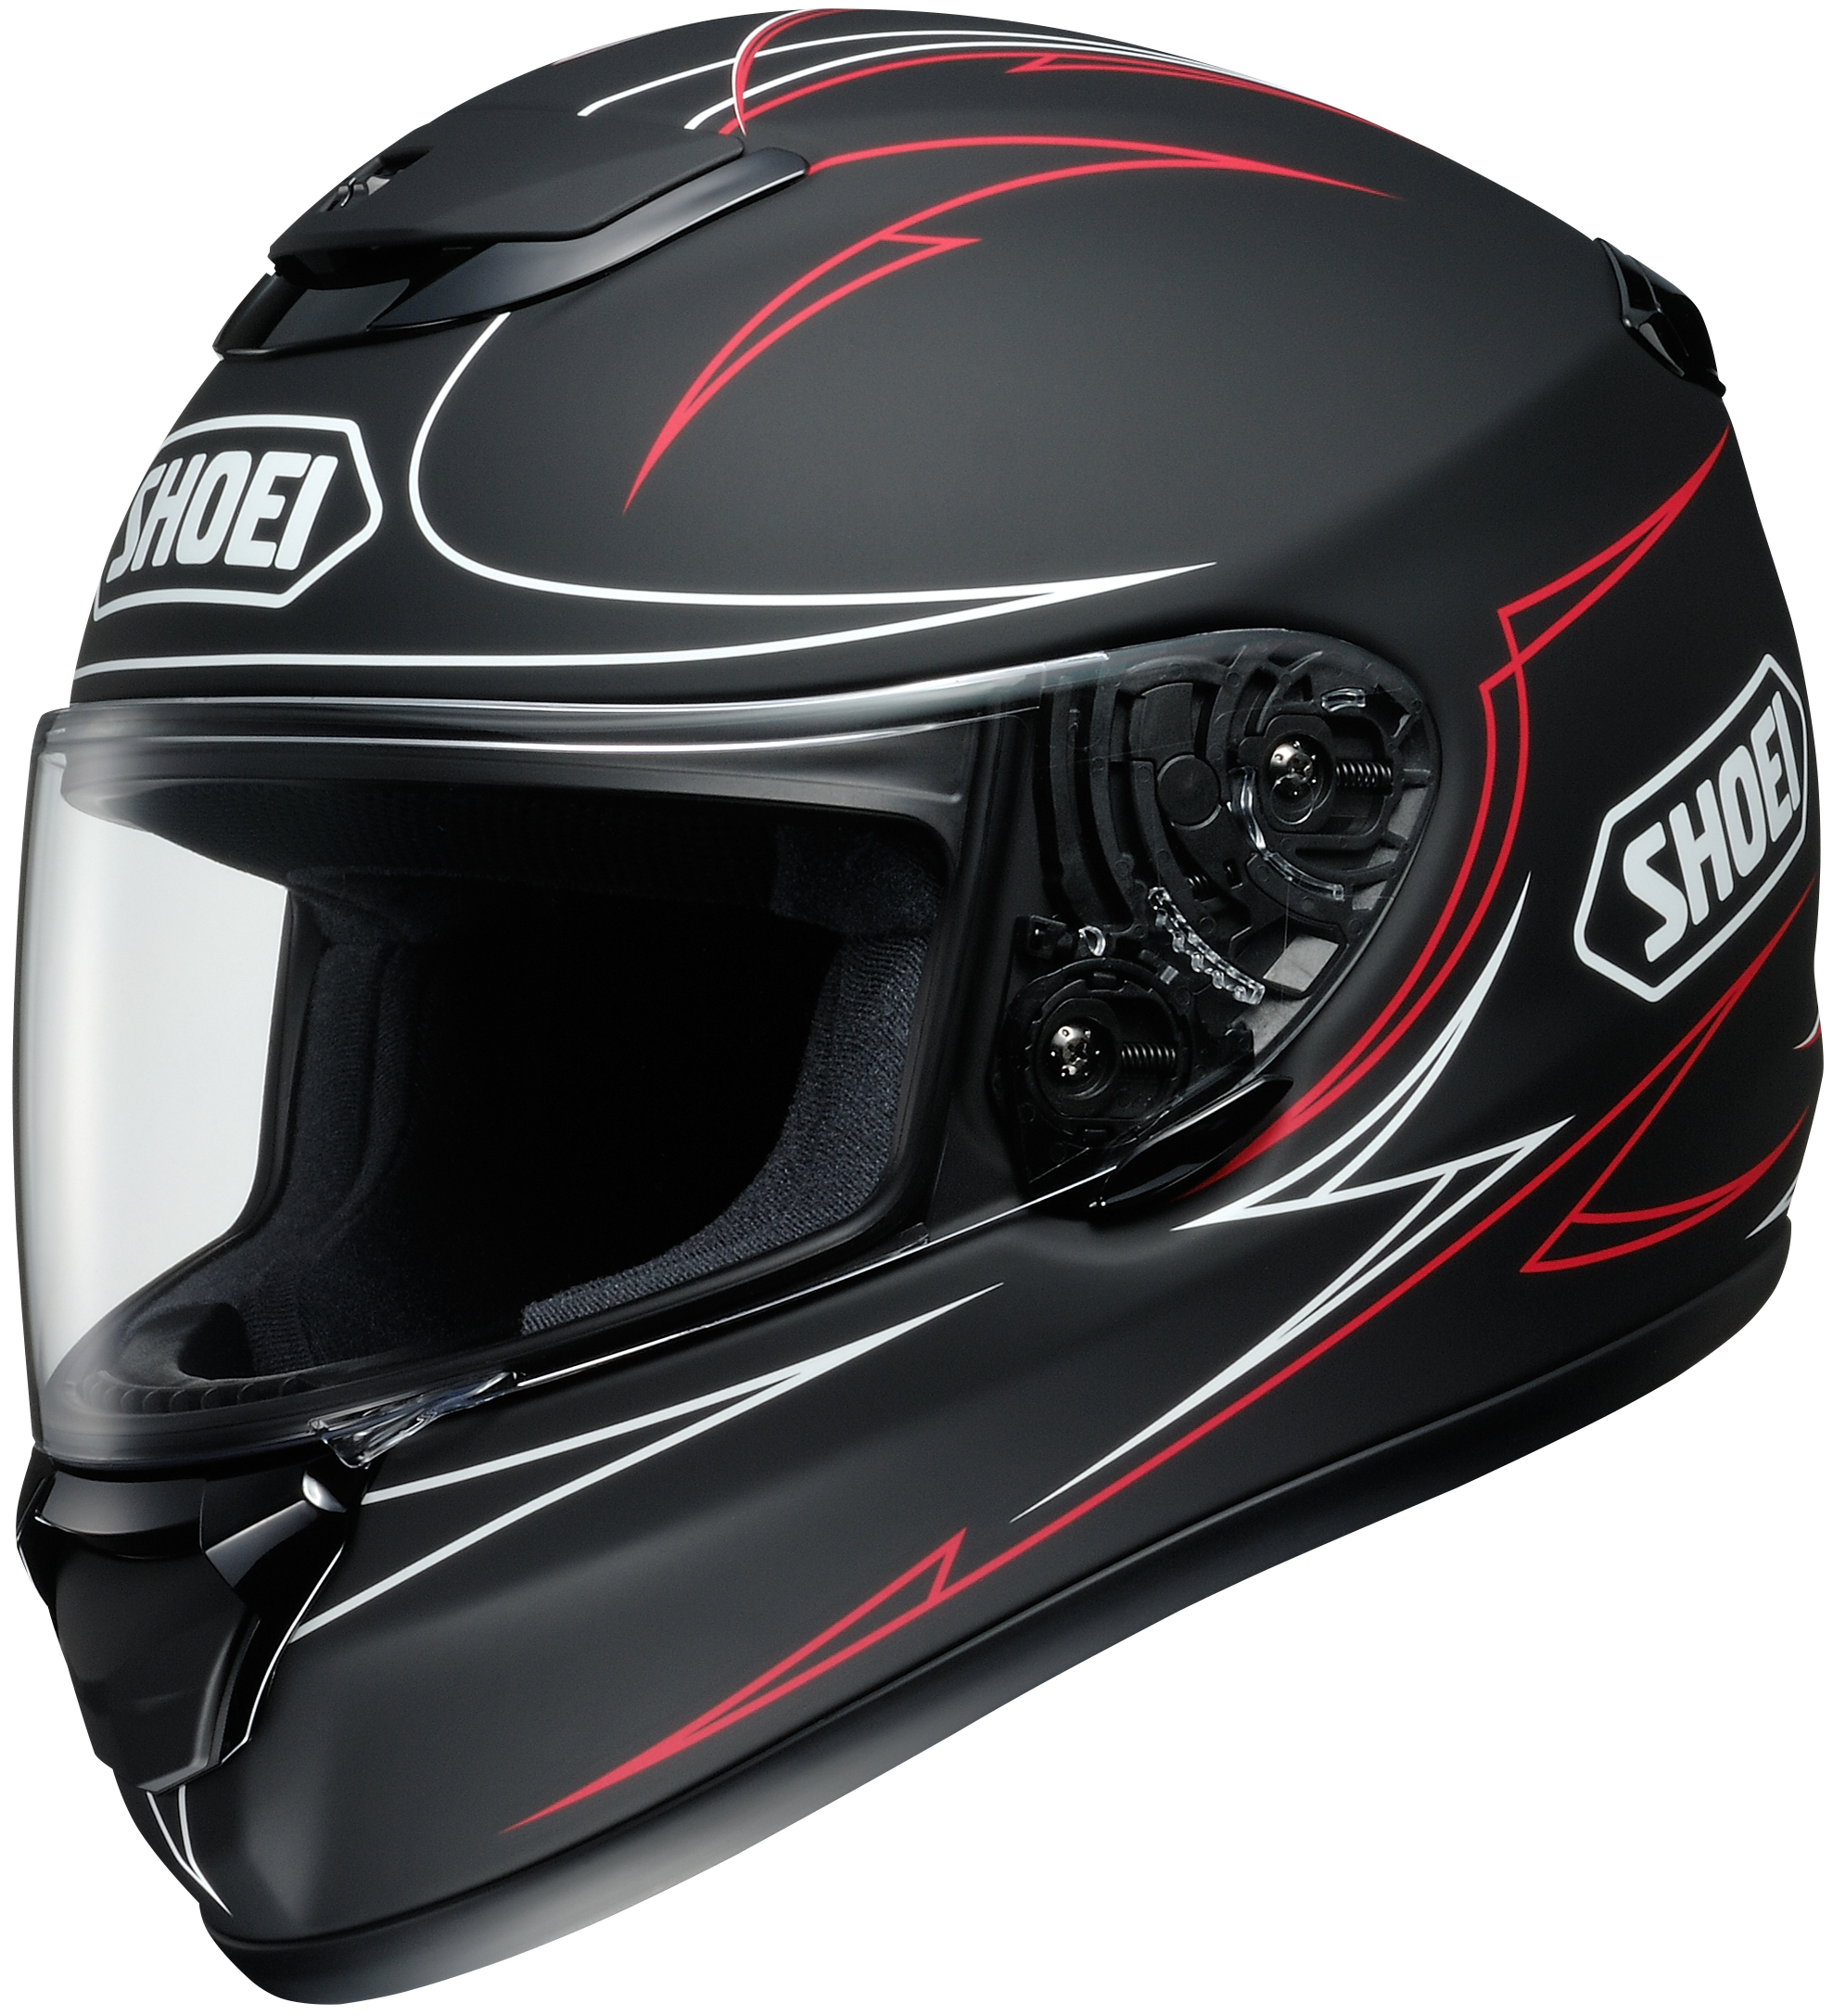 Qwest Wanderlust Helmet